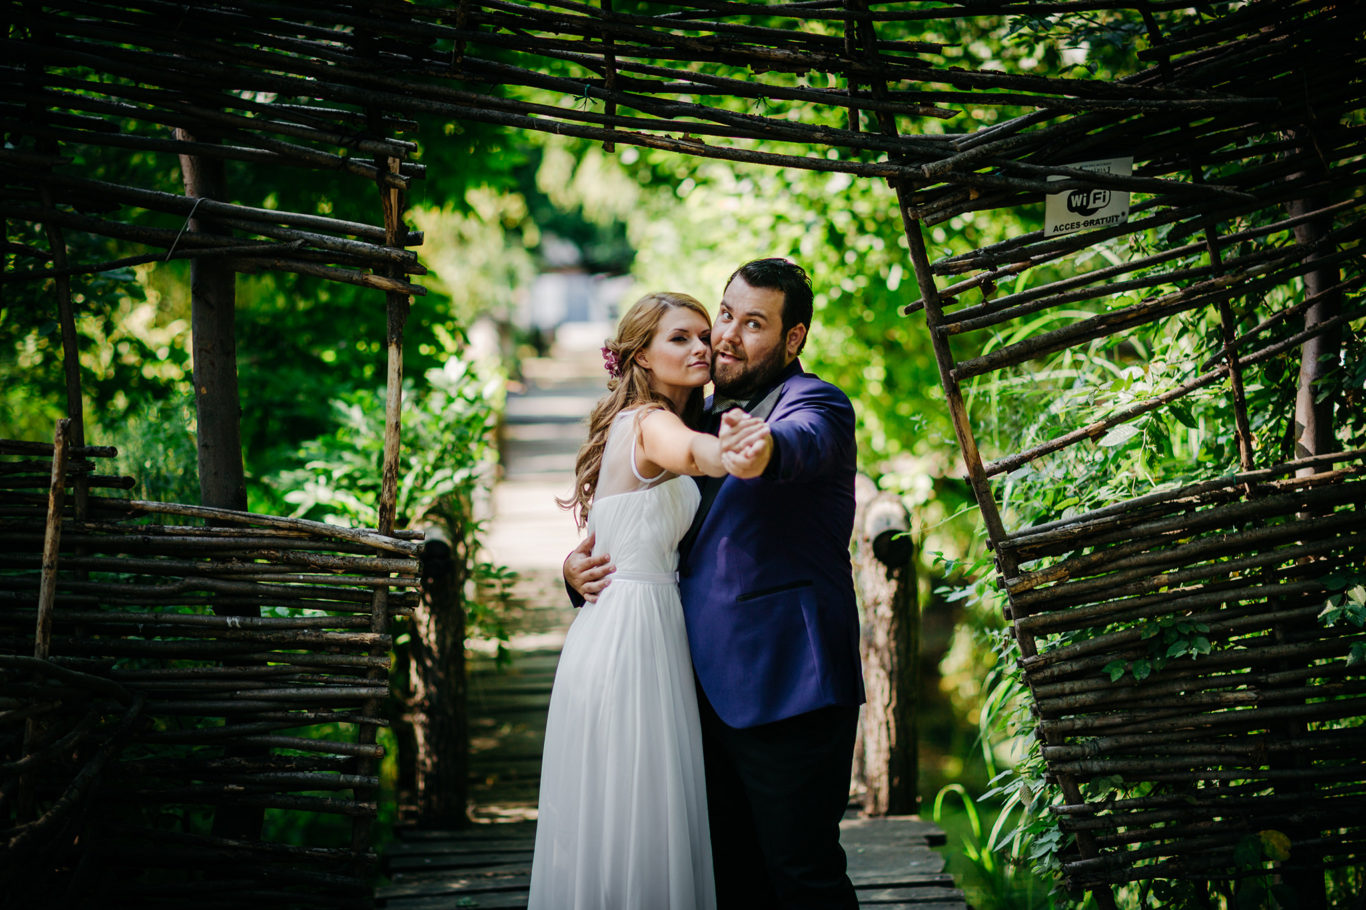 0187-fotografie-nunta-bucuresti-rodica-rares-fotograf-ciprian-dumitrescu-cd2_0077-3